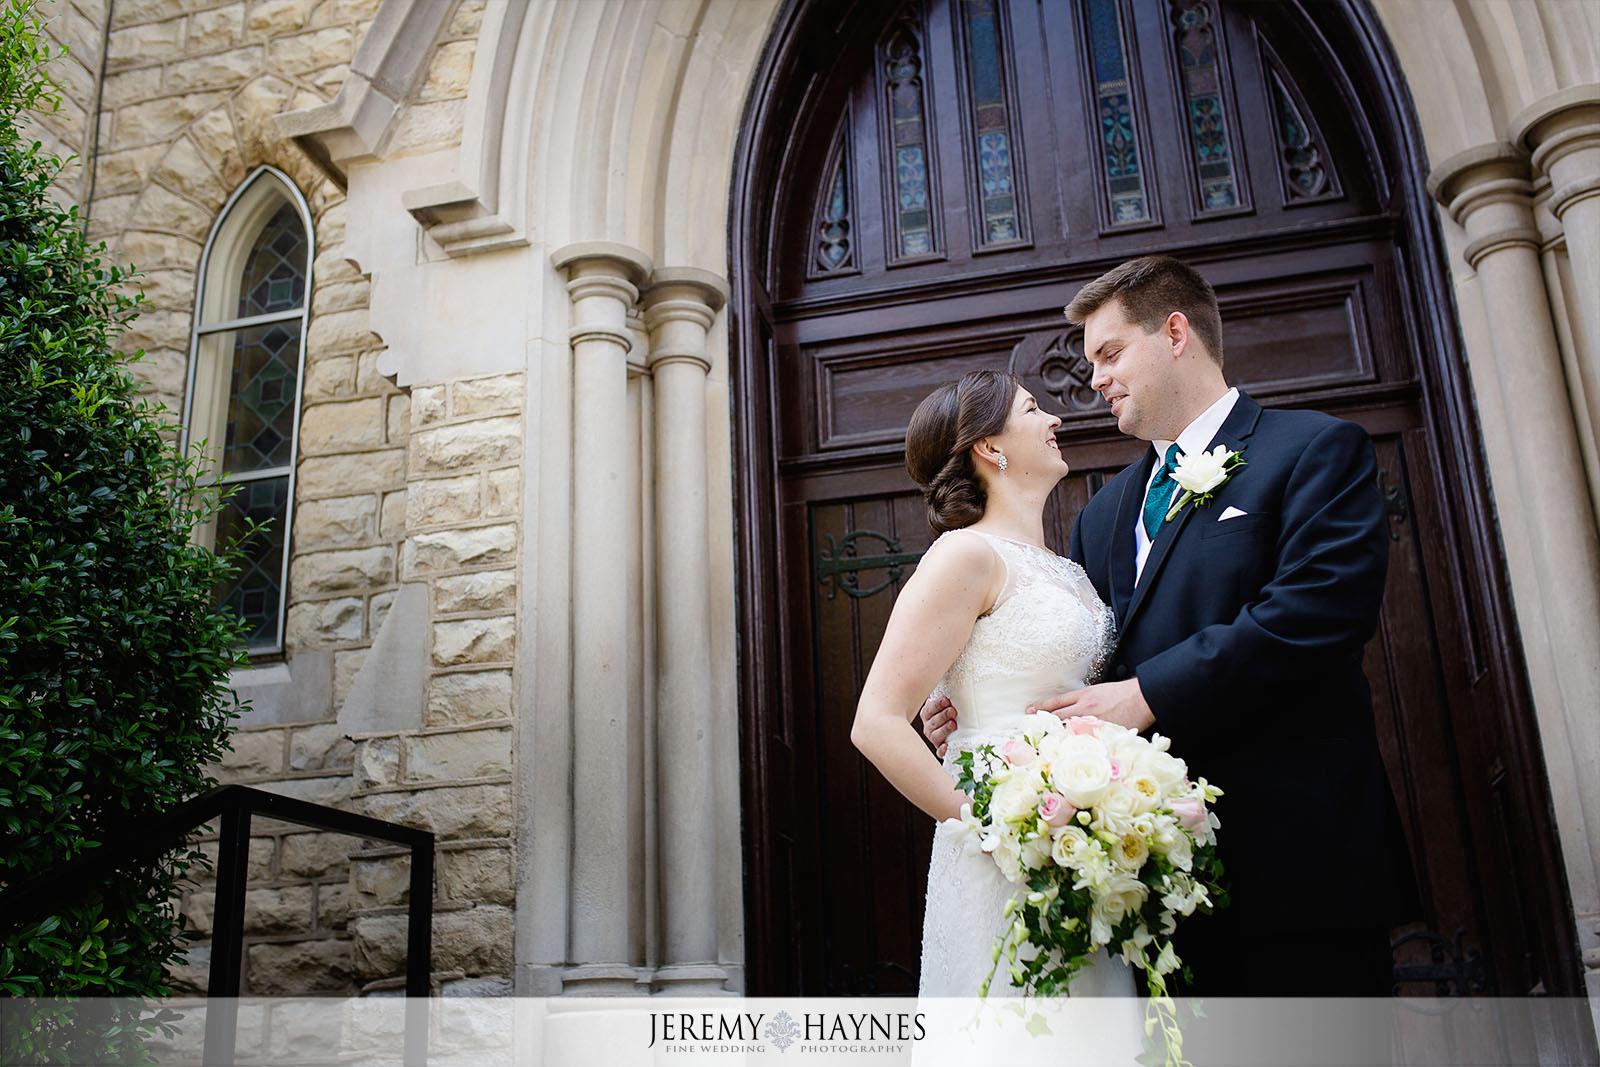 st-louis-bertrand-catholic-church-wedding-ceremony-7.jpg